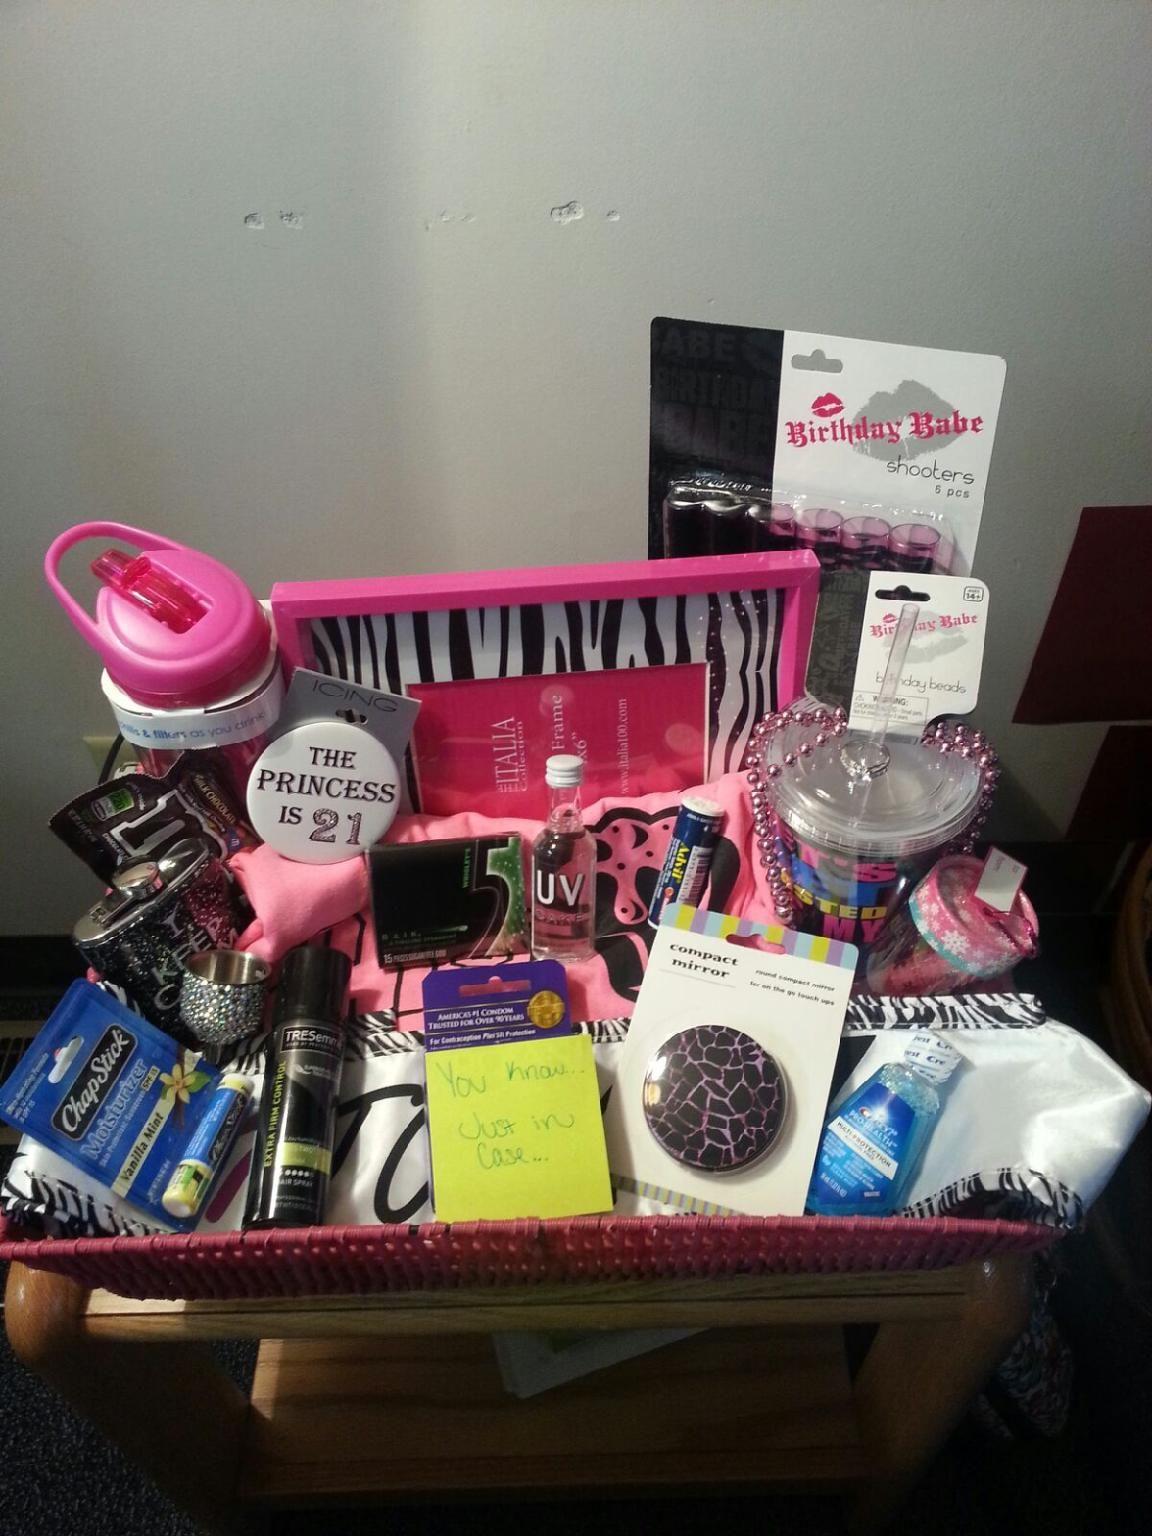 21st birthday basket 21 gifts water bottle, shot glasses